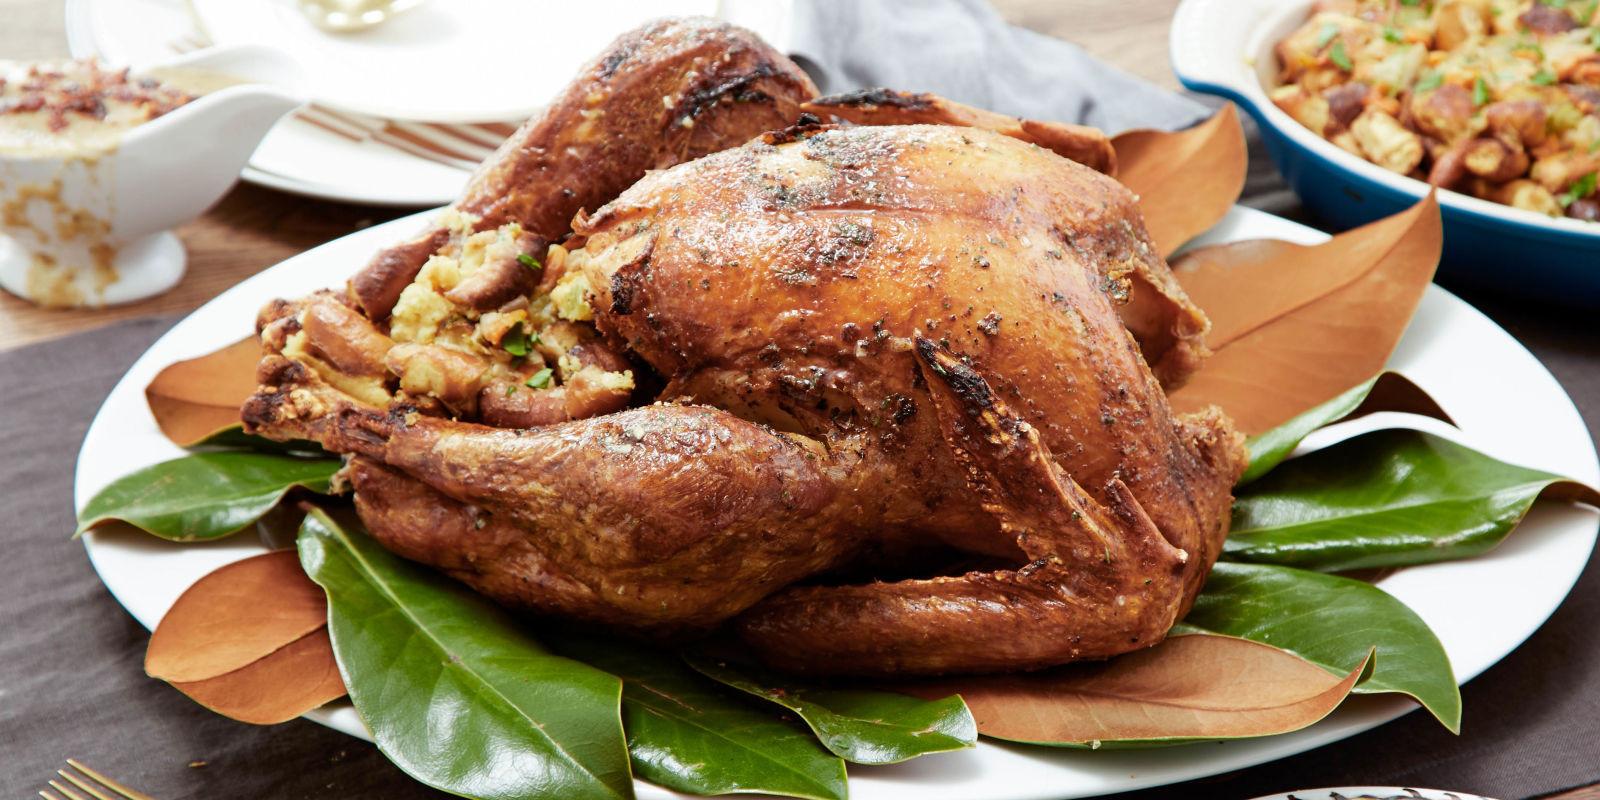 Traditional Thanksgiving Turkey Recipe  40 Traditional Thanksgiving Dinner Menu and Recipes